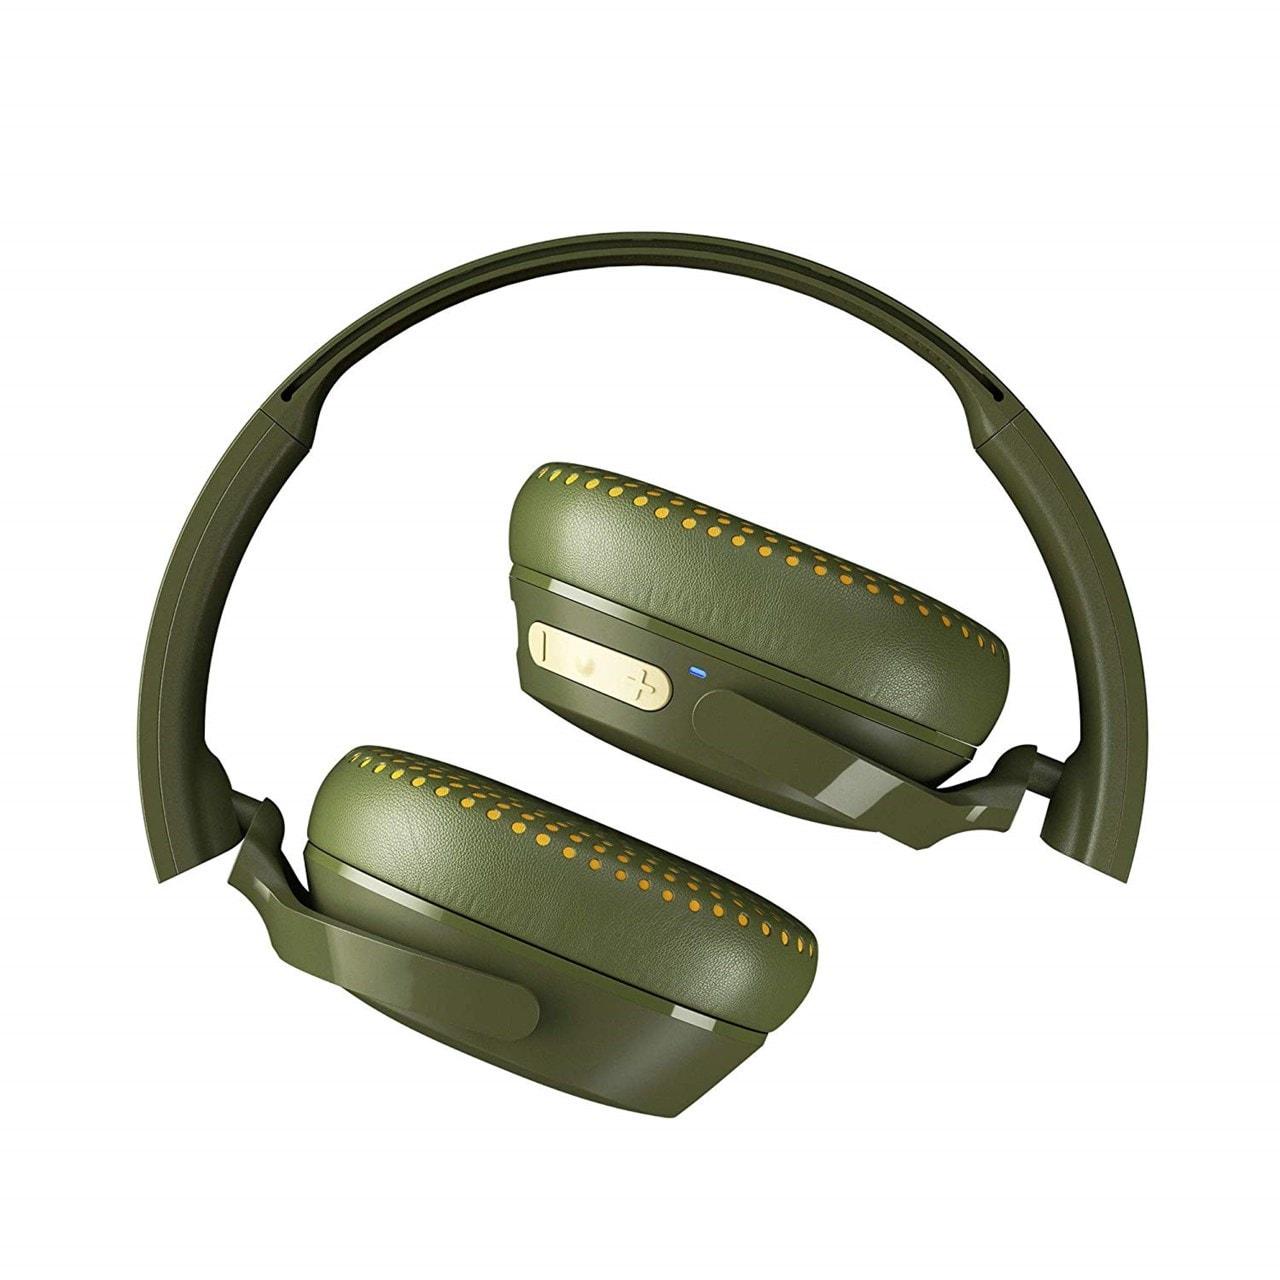 Skullcandy Riff Moss/Olive/Yellow Bluetooth Headphones - 4